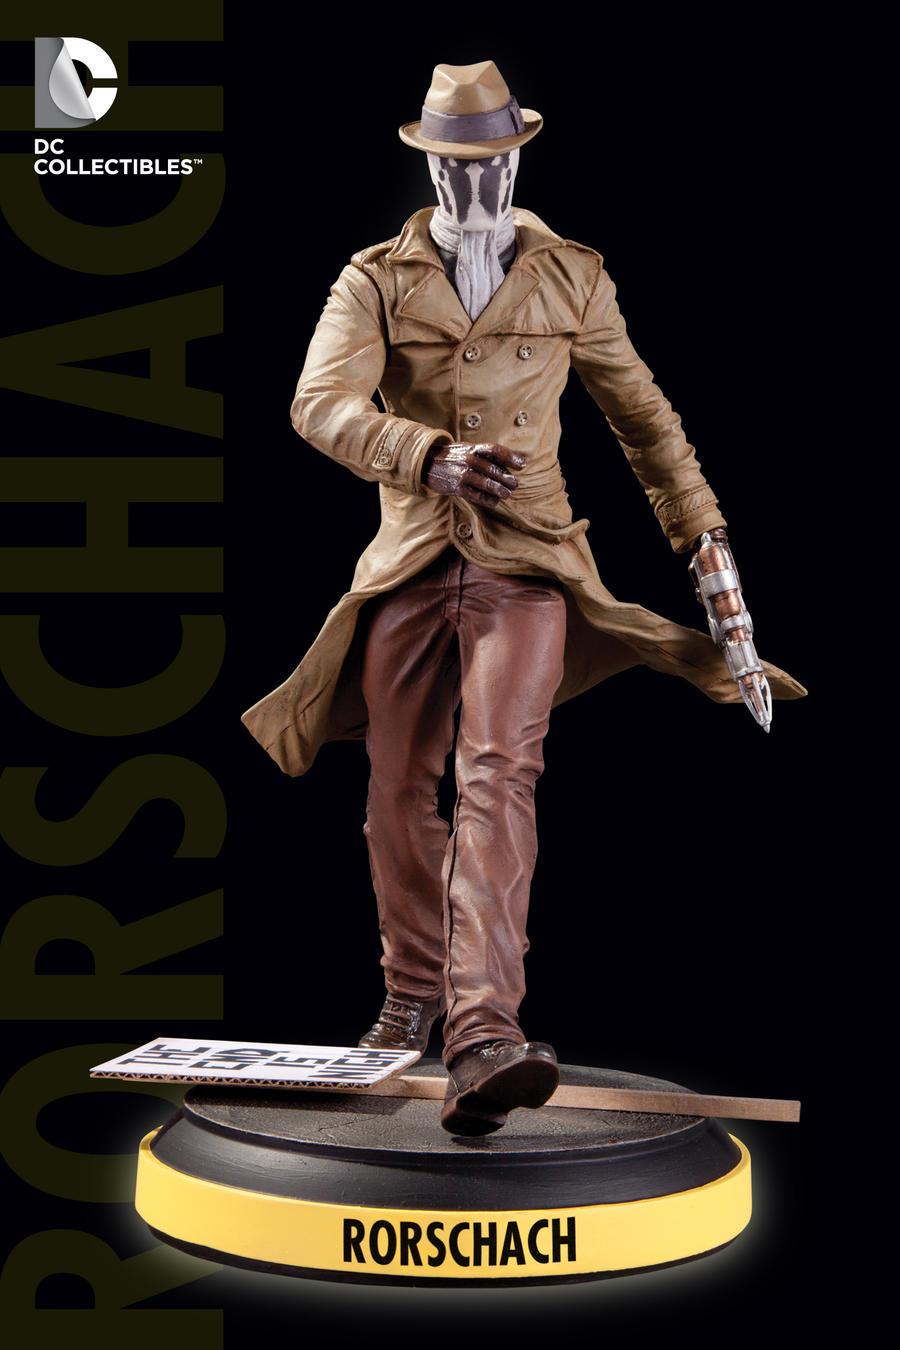 Rorschach DC Solicitations 2 by BLACKPLAGUE1348